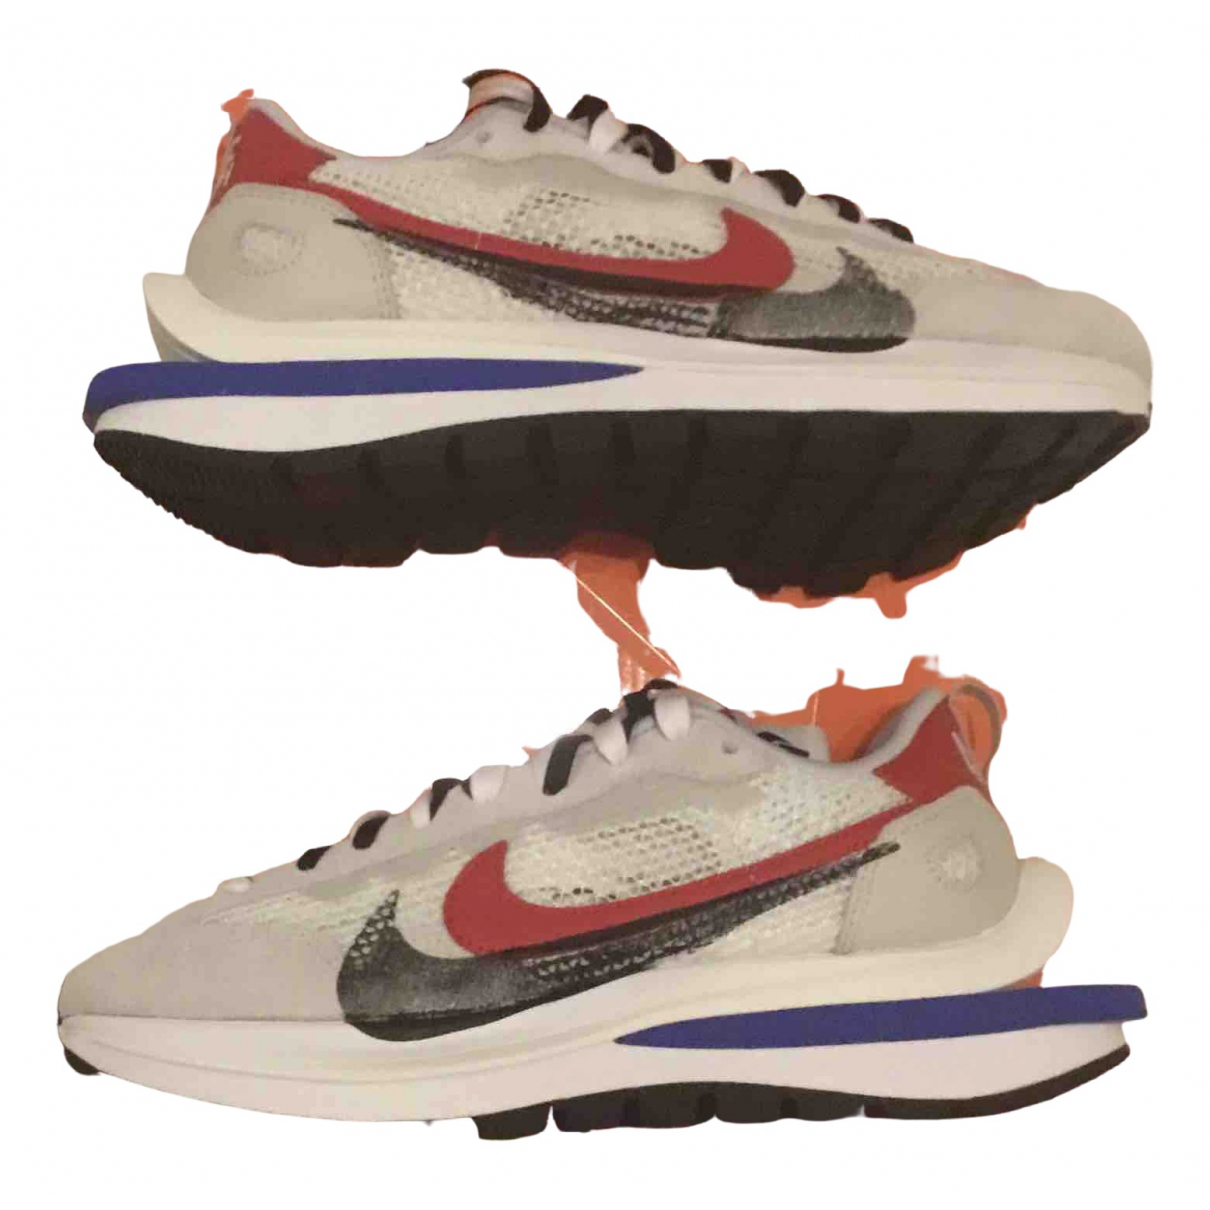 Deportivas Vaporwaffle de Lona Nike X Sacai